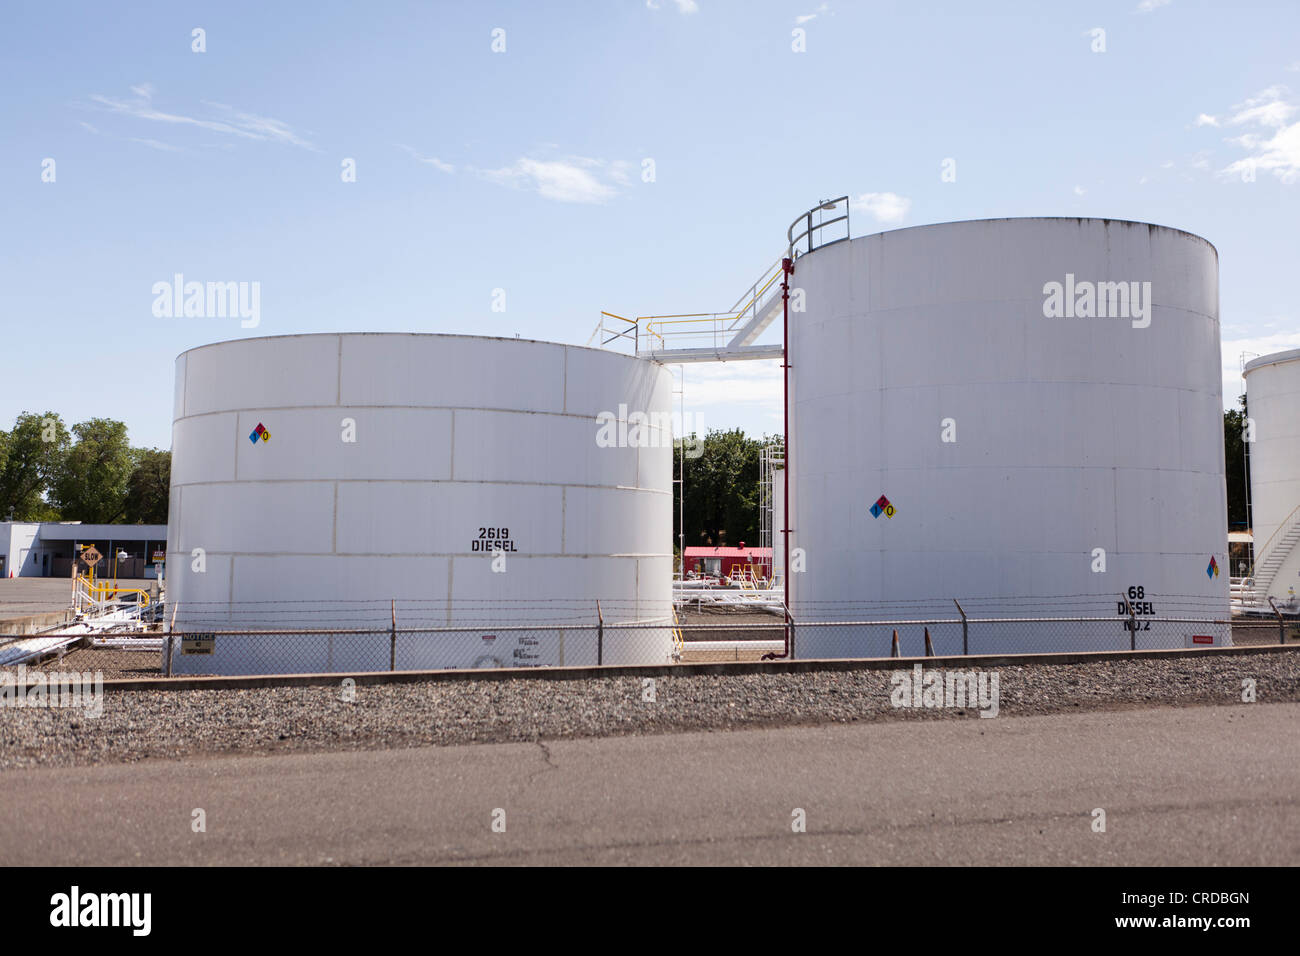 Industrial fuel storage tanks - Stock Image